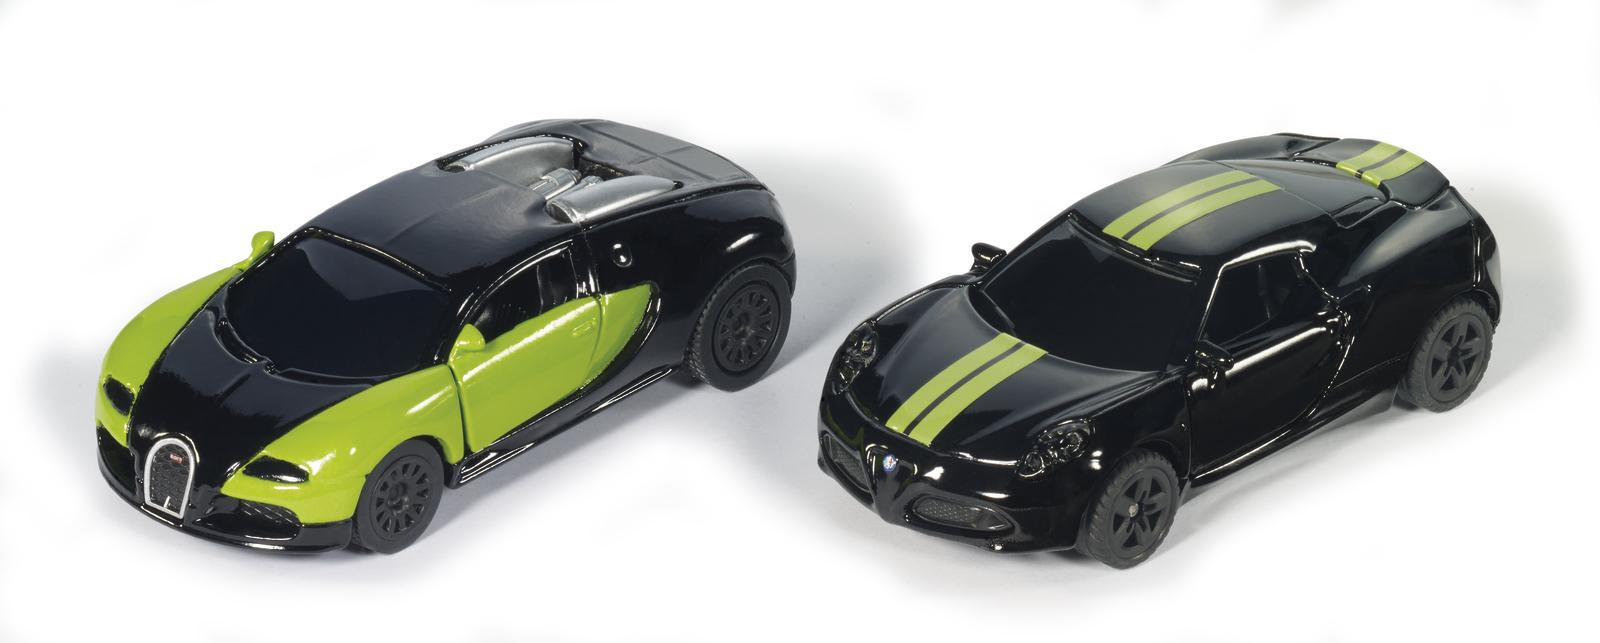 Siku: 2-Piece Black & Green Special Edition Cars image